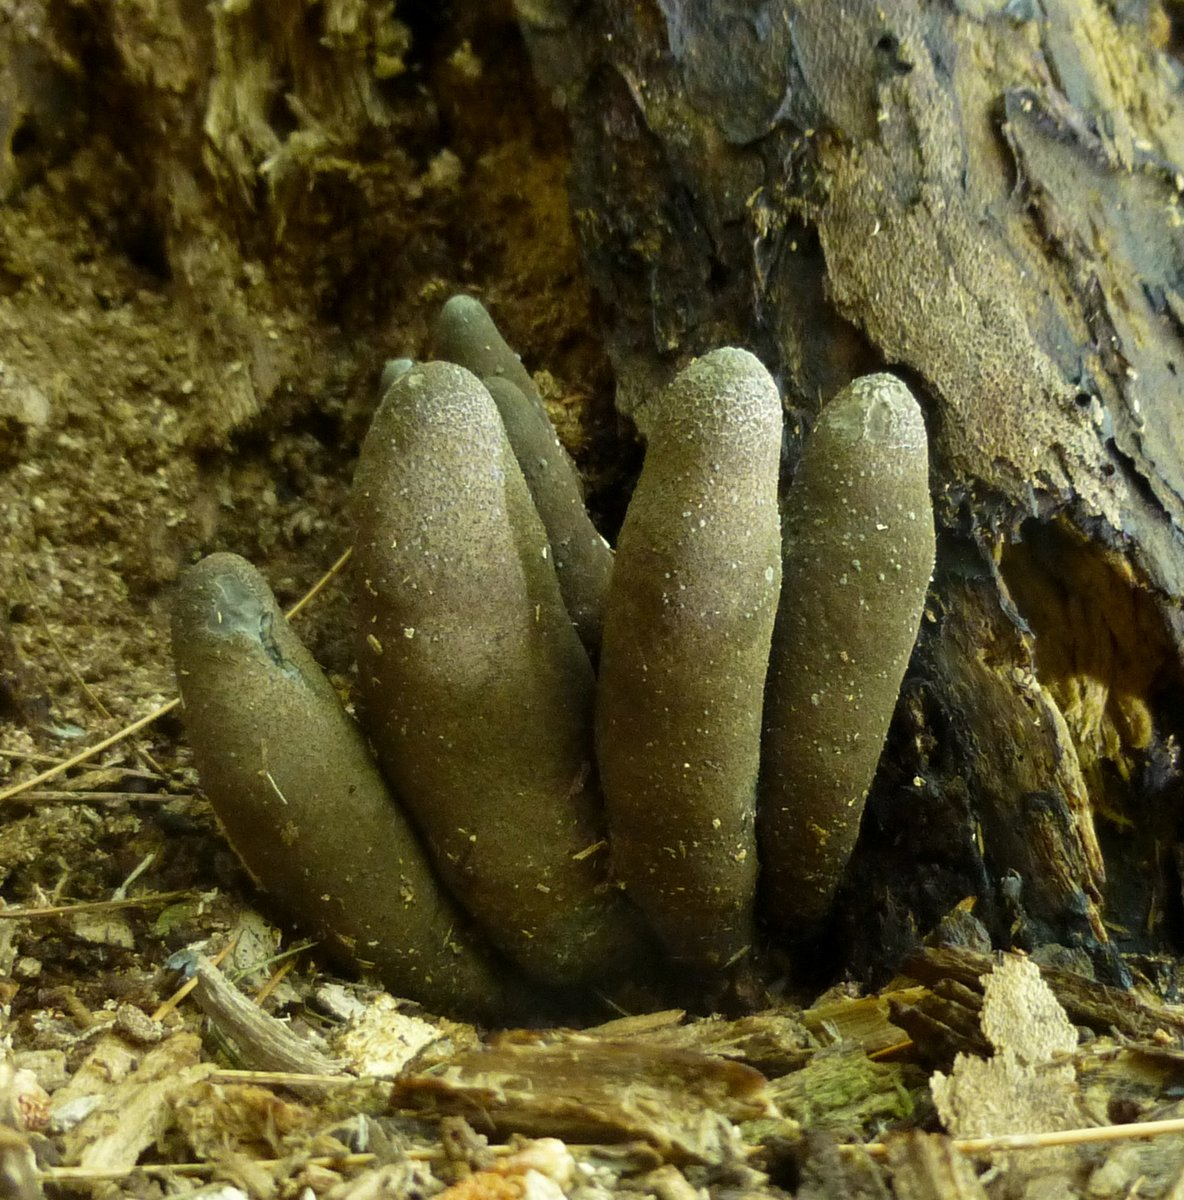 11. Dead Man's Finger aka Xylaria polymorpha